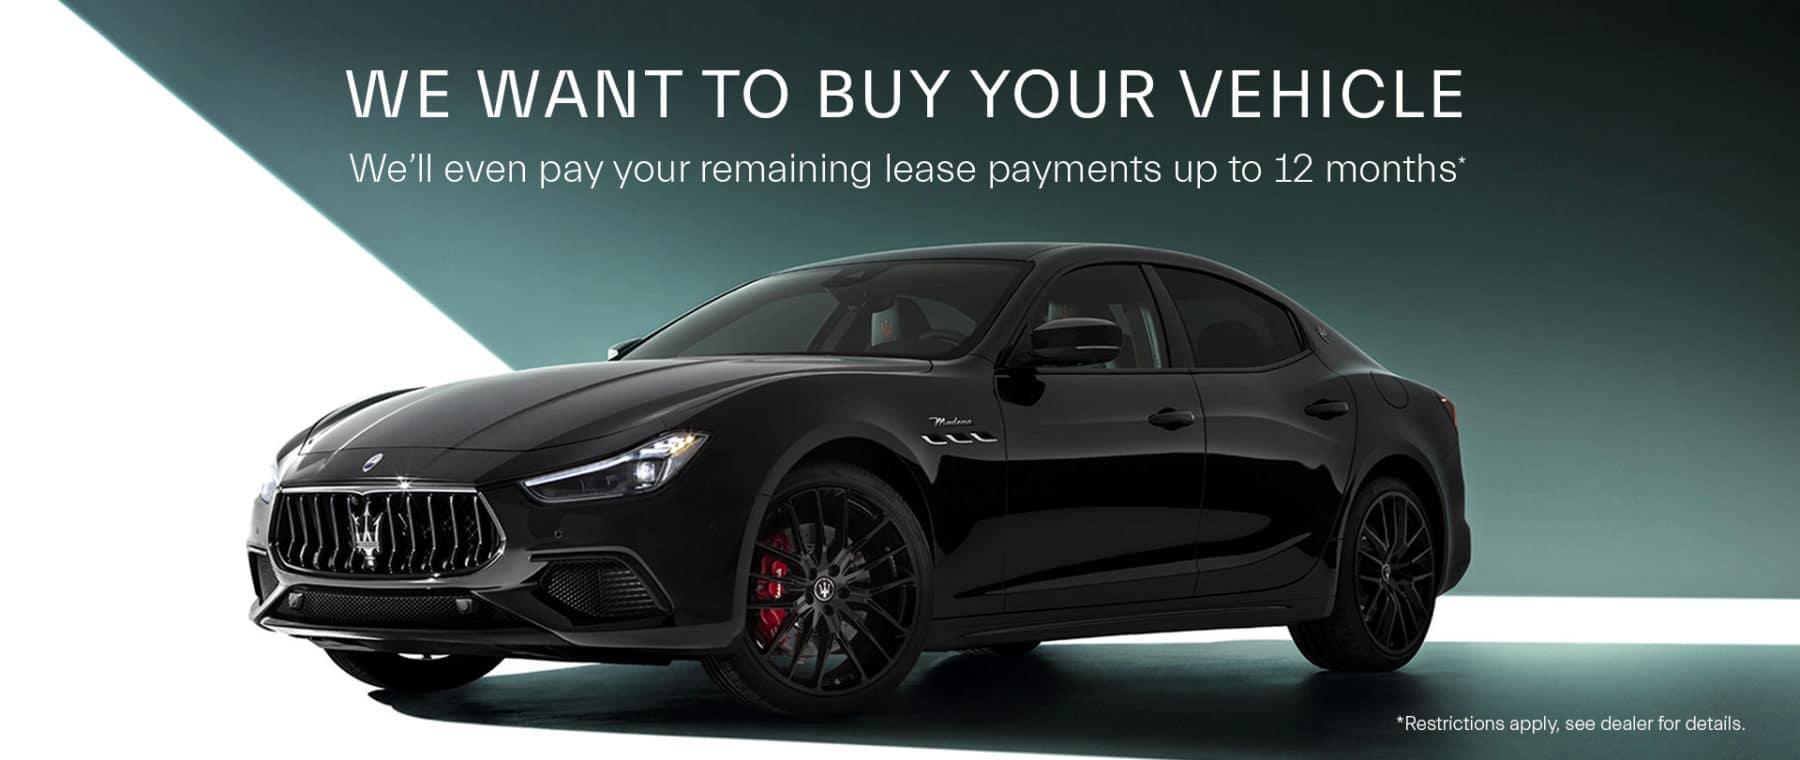 Maserati_Ghibli_webbanner_2